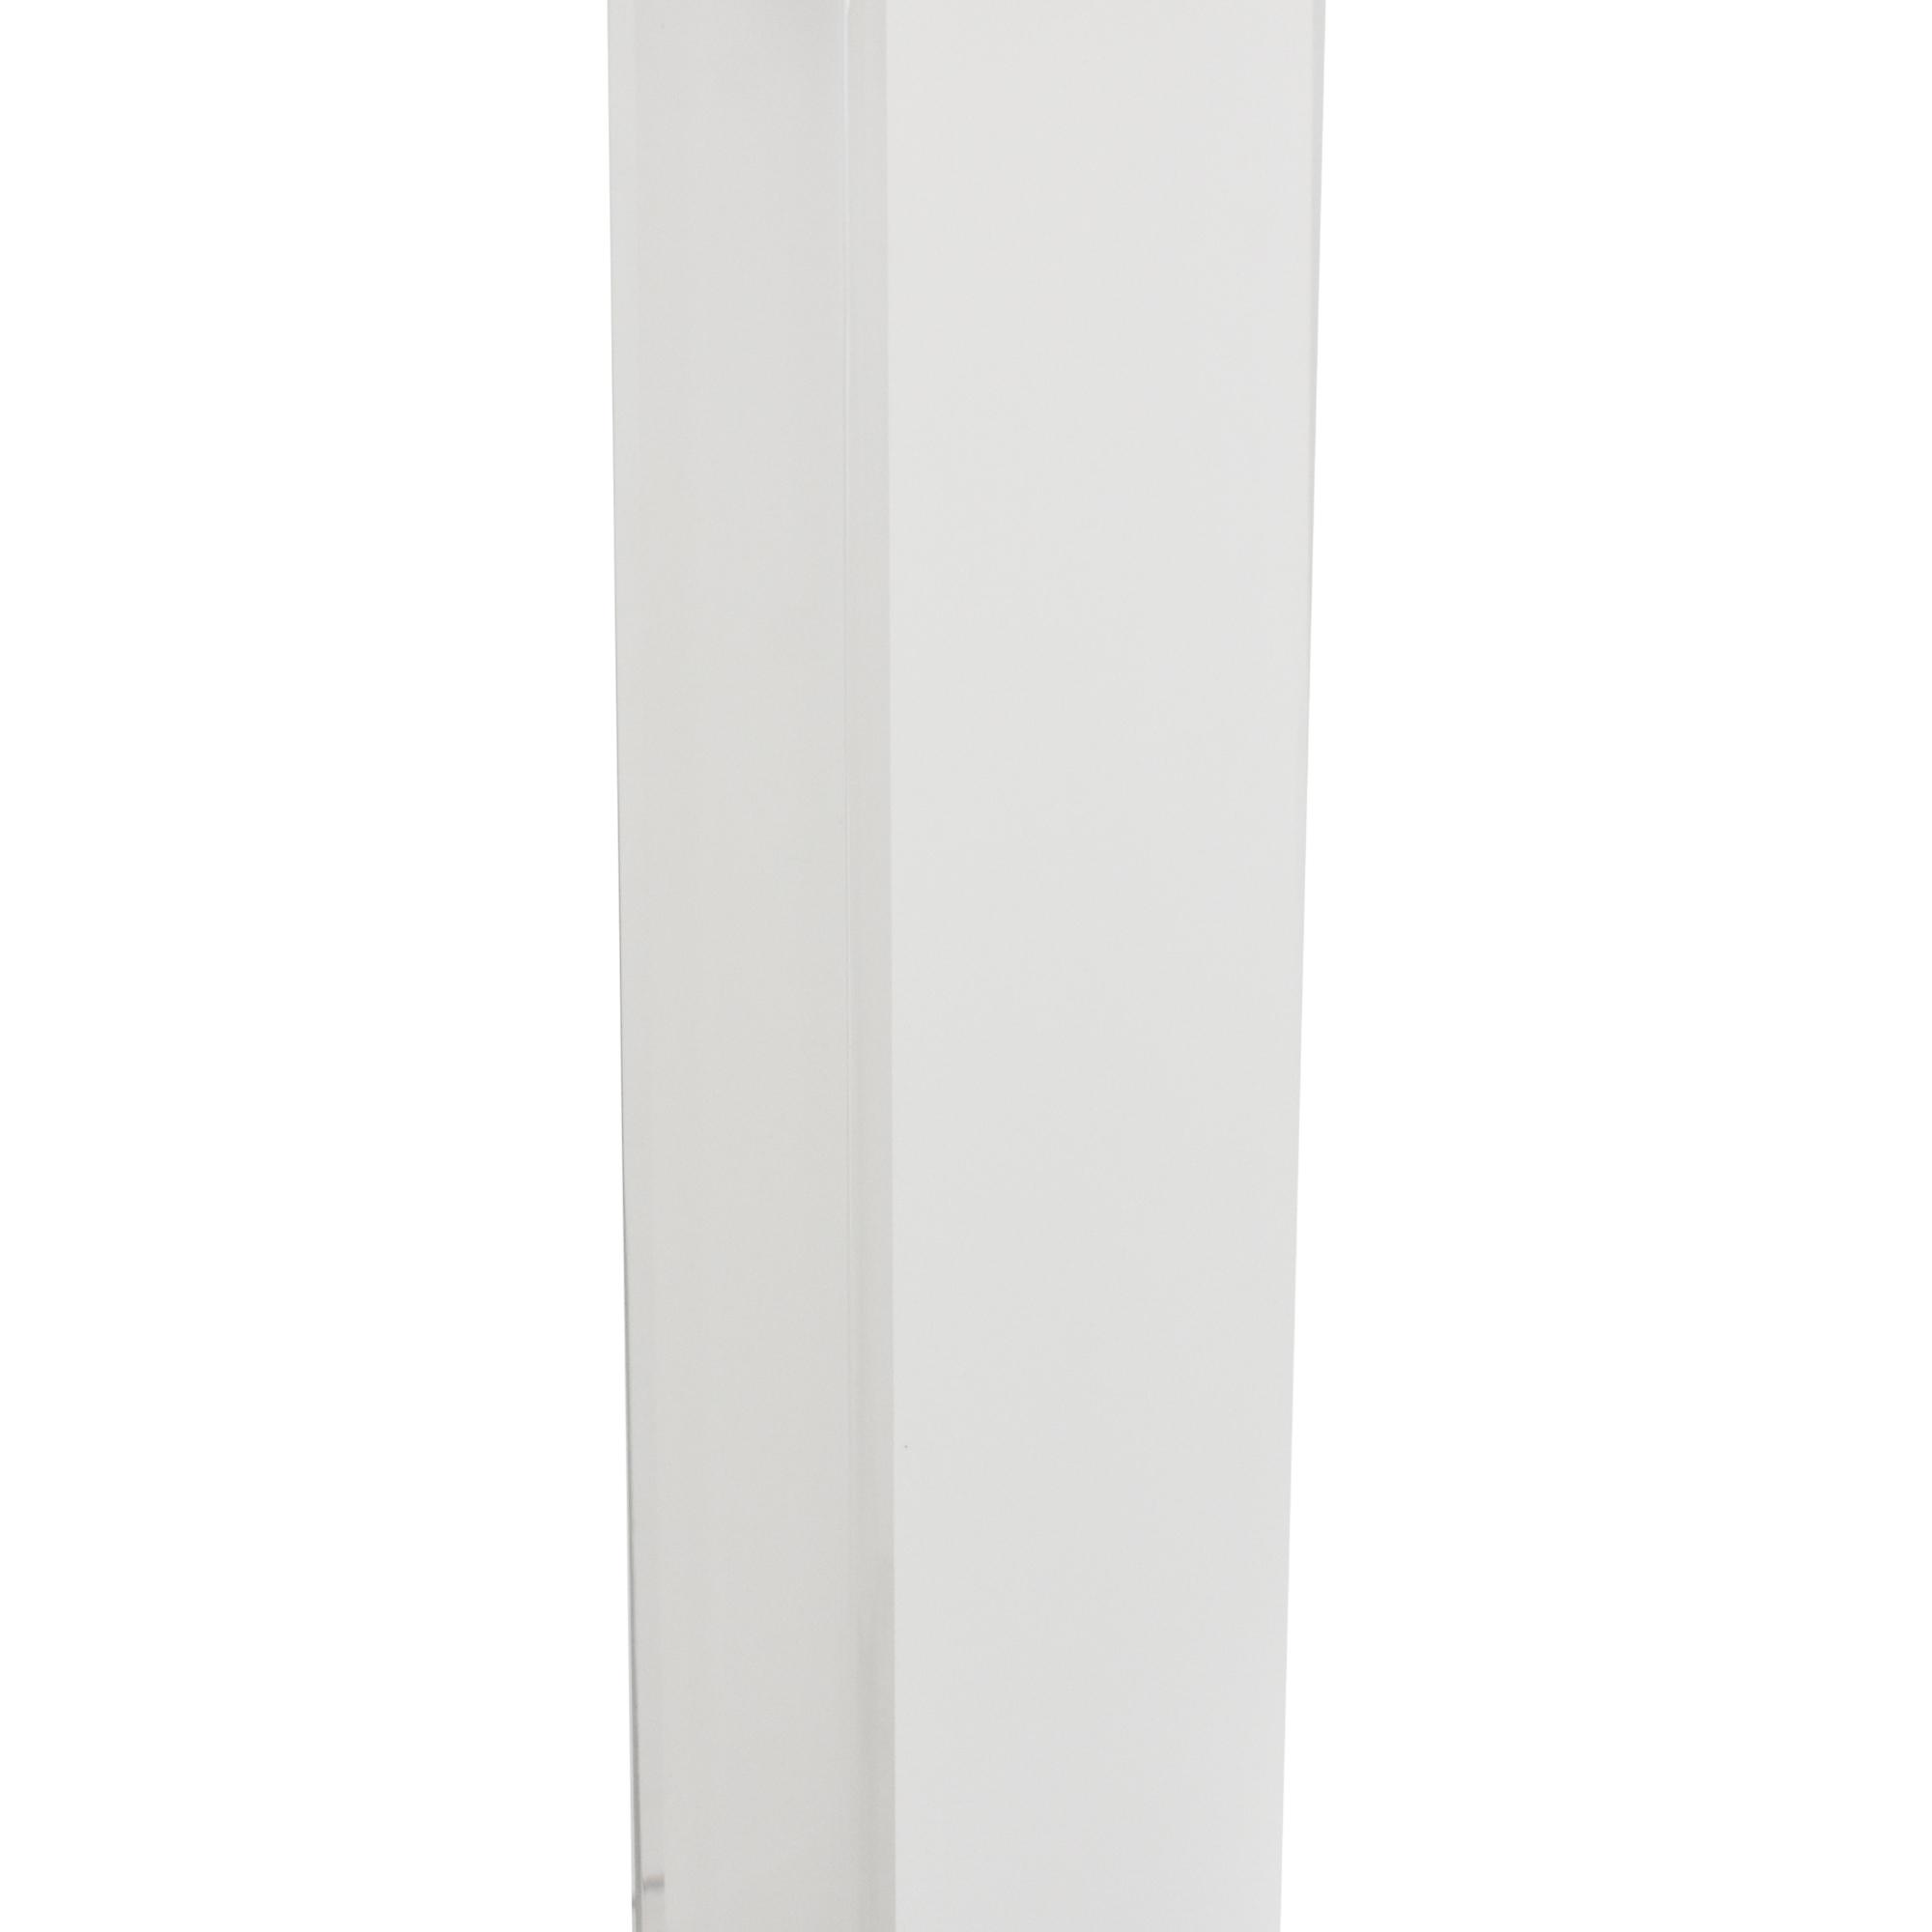 Pablo Designs Pablo Designs Cortina Modern Floor Lamp discount